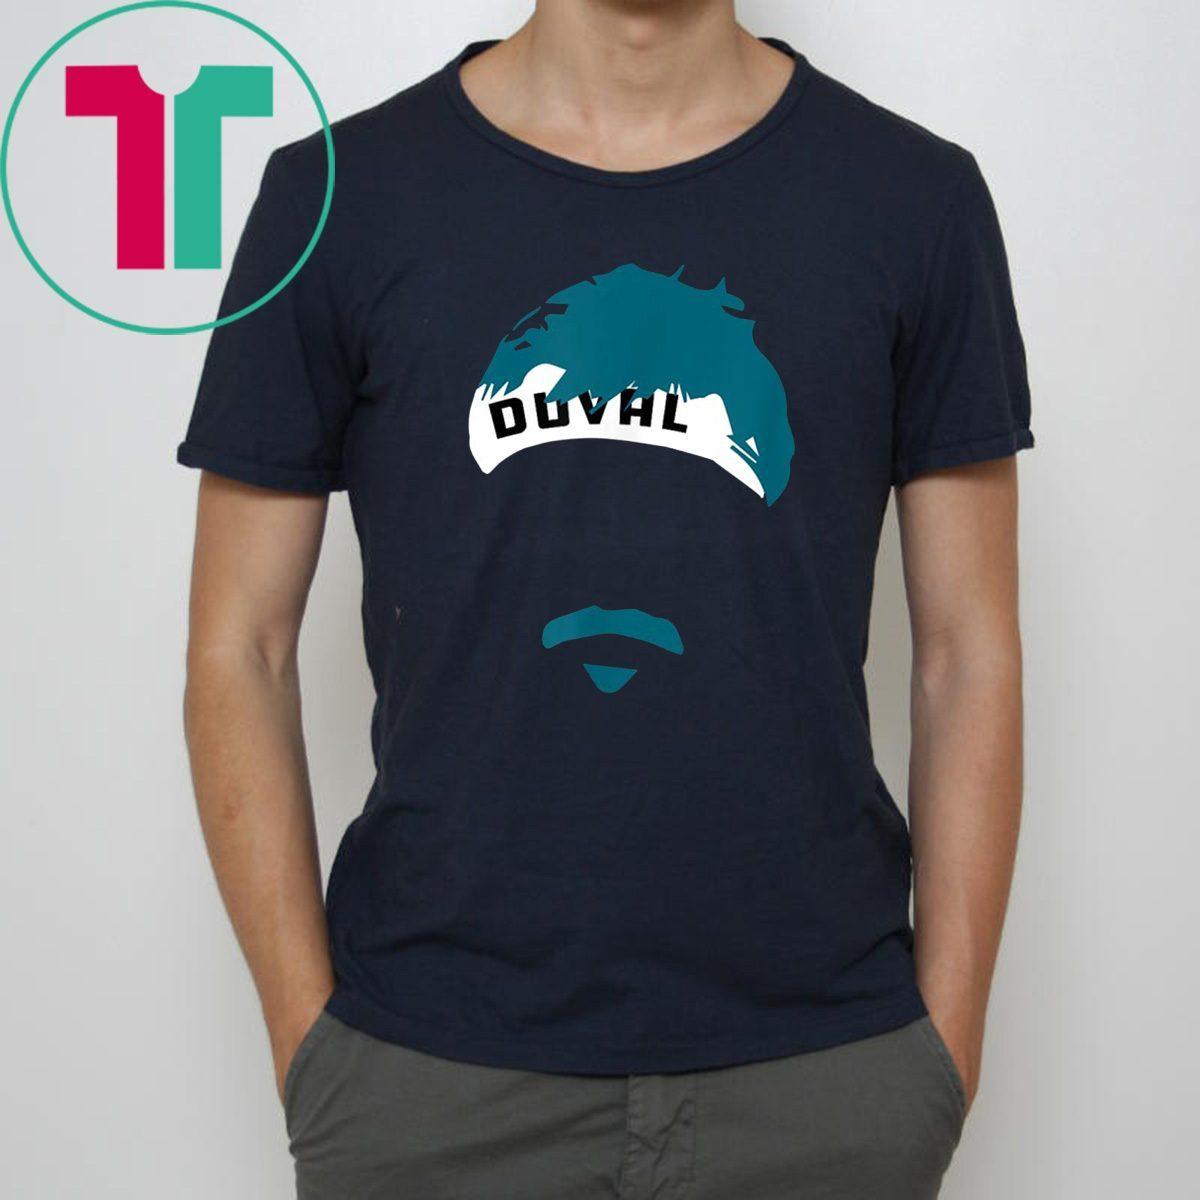 buy online 16b02 2094c Minshew Headband Duval T-Shirt - OrderQuilt.com